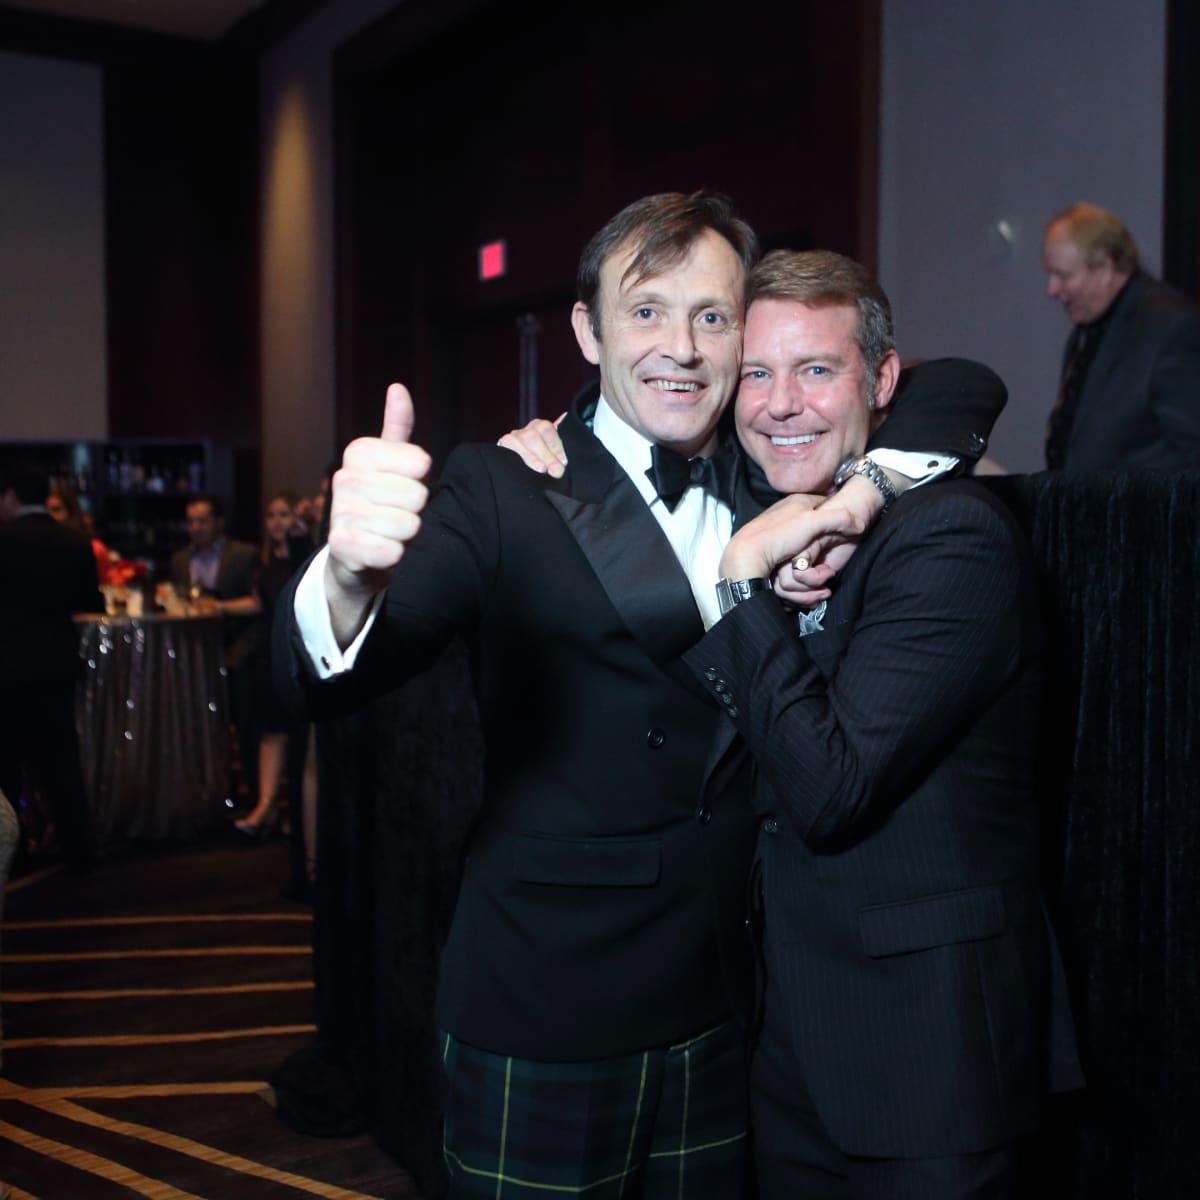 News, Shelby, Women's Home gala, Nov. 2015, Angus Adam, Paul David Van Atta